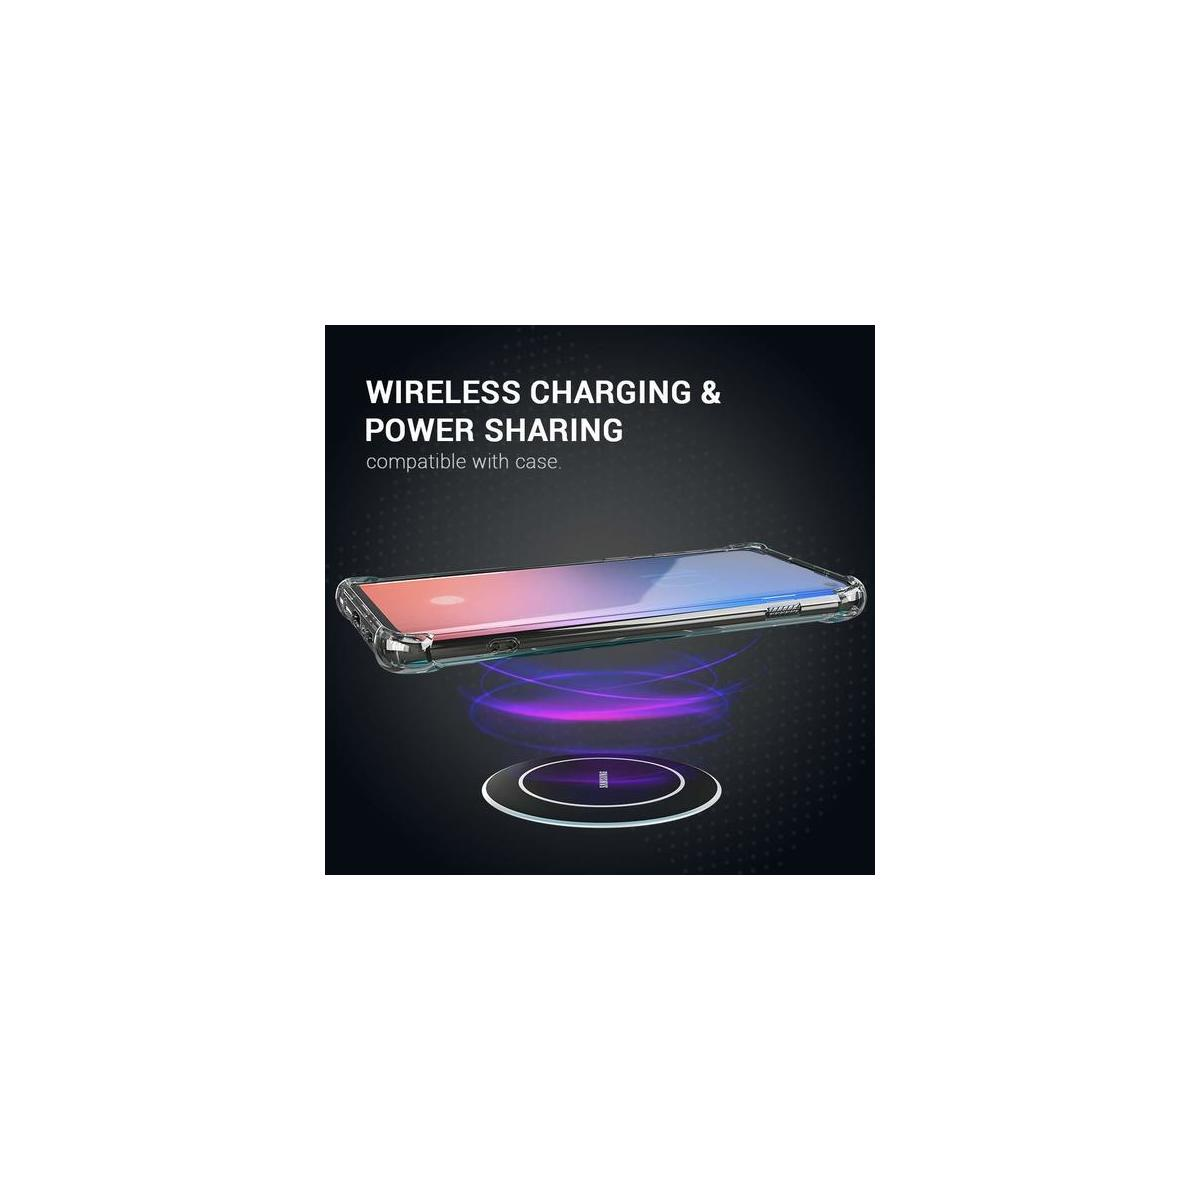 Samsung Galaxy S10 Case - Clear TPU Acrylic Protective Heavy Duty Phone Case